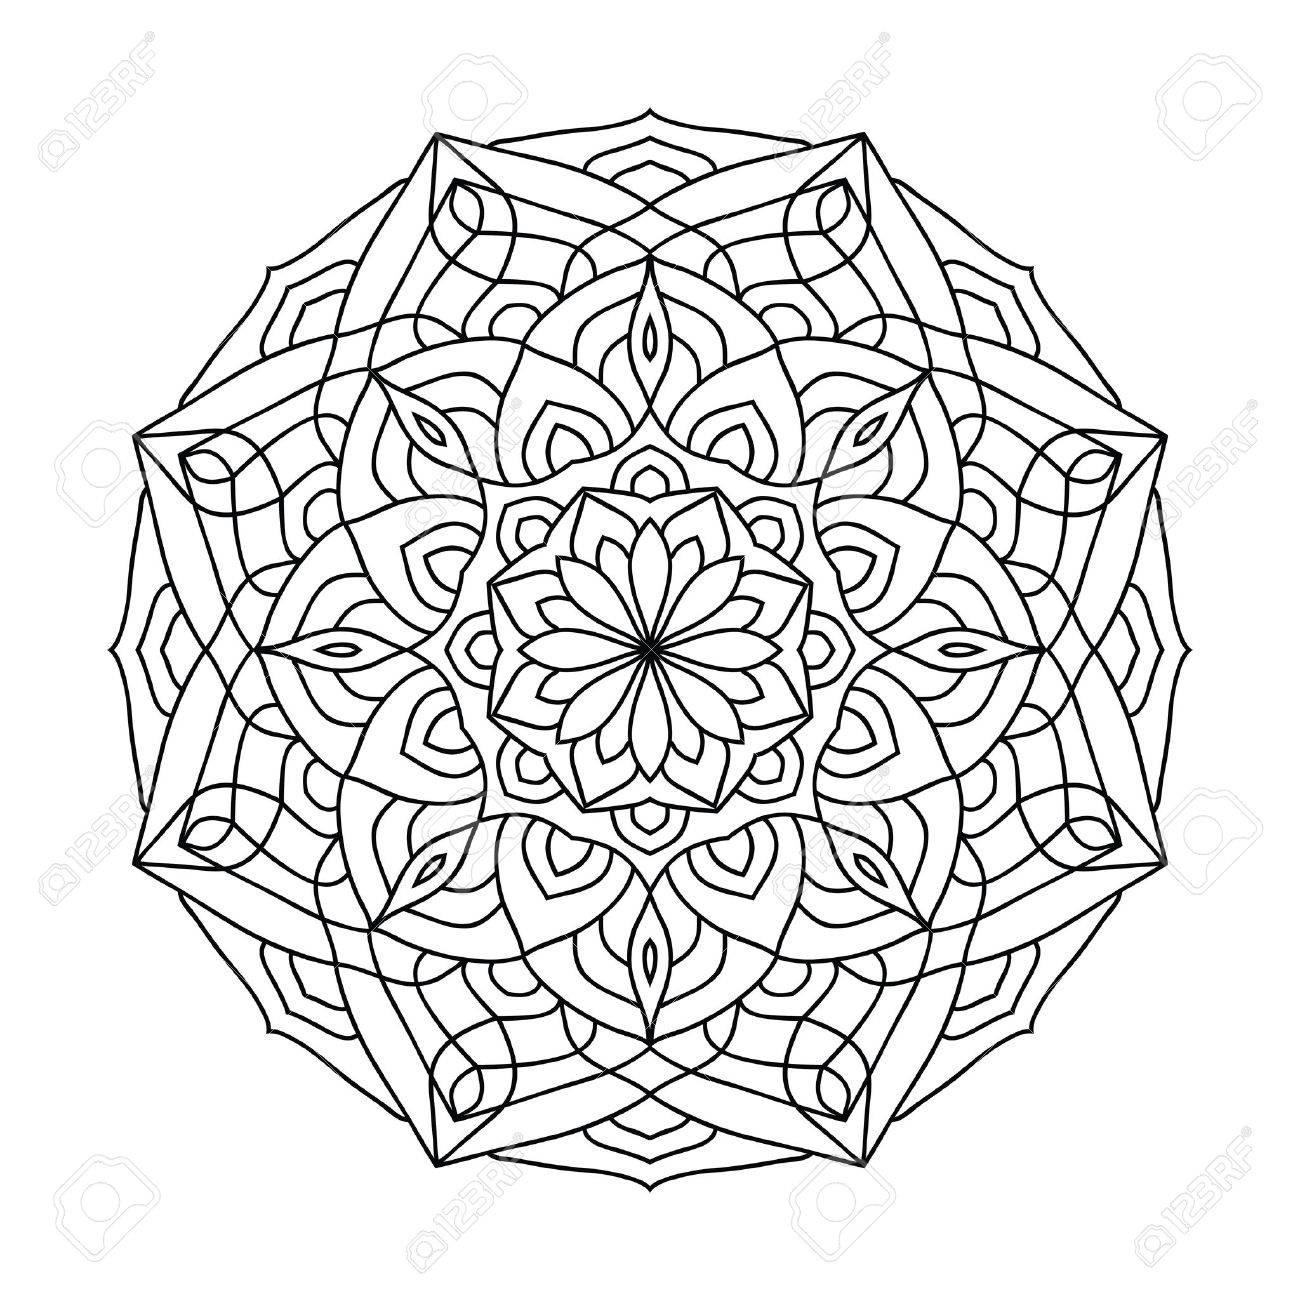 Libro Para Colorear Mandala Para Adultos Amuleto Decorativa étnica